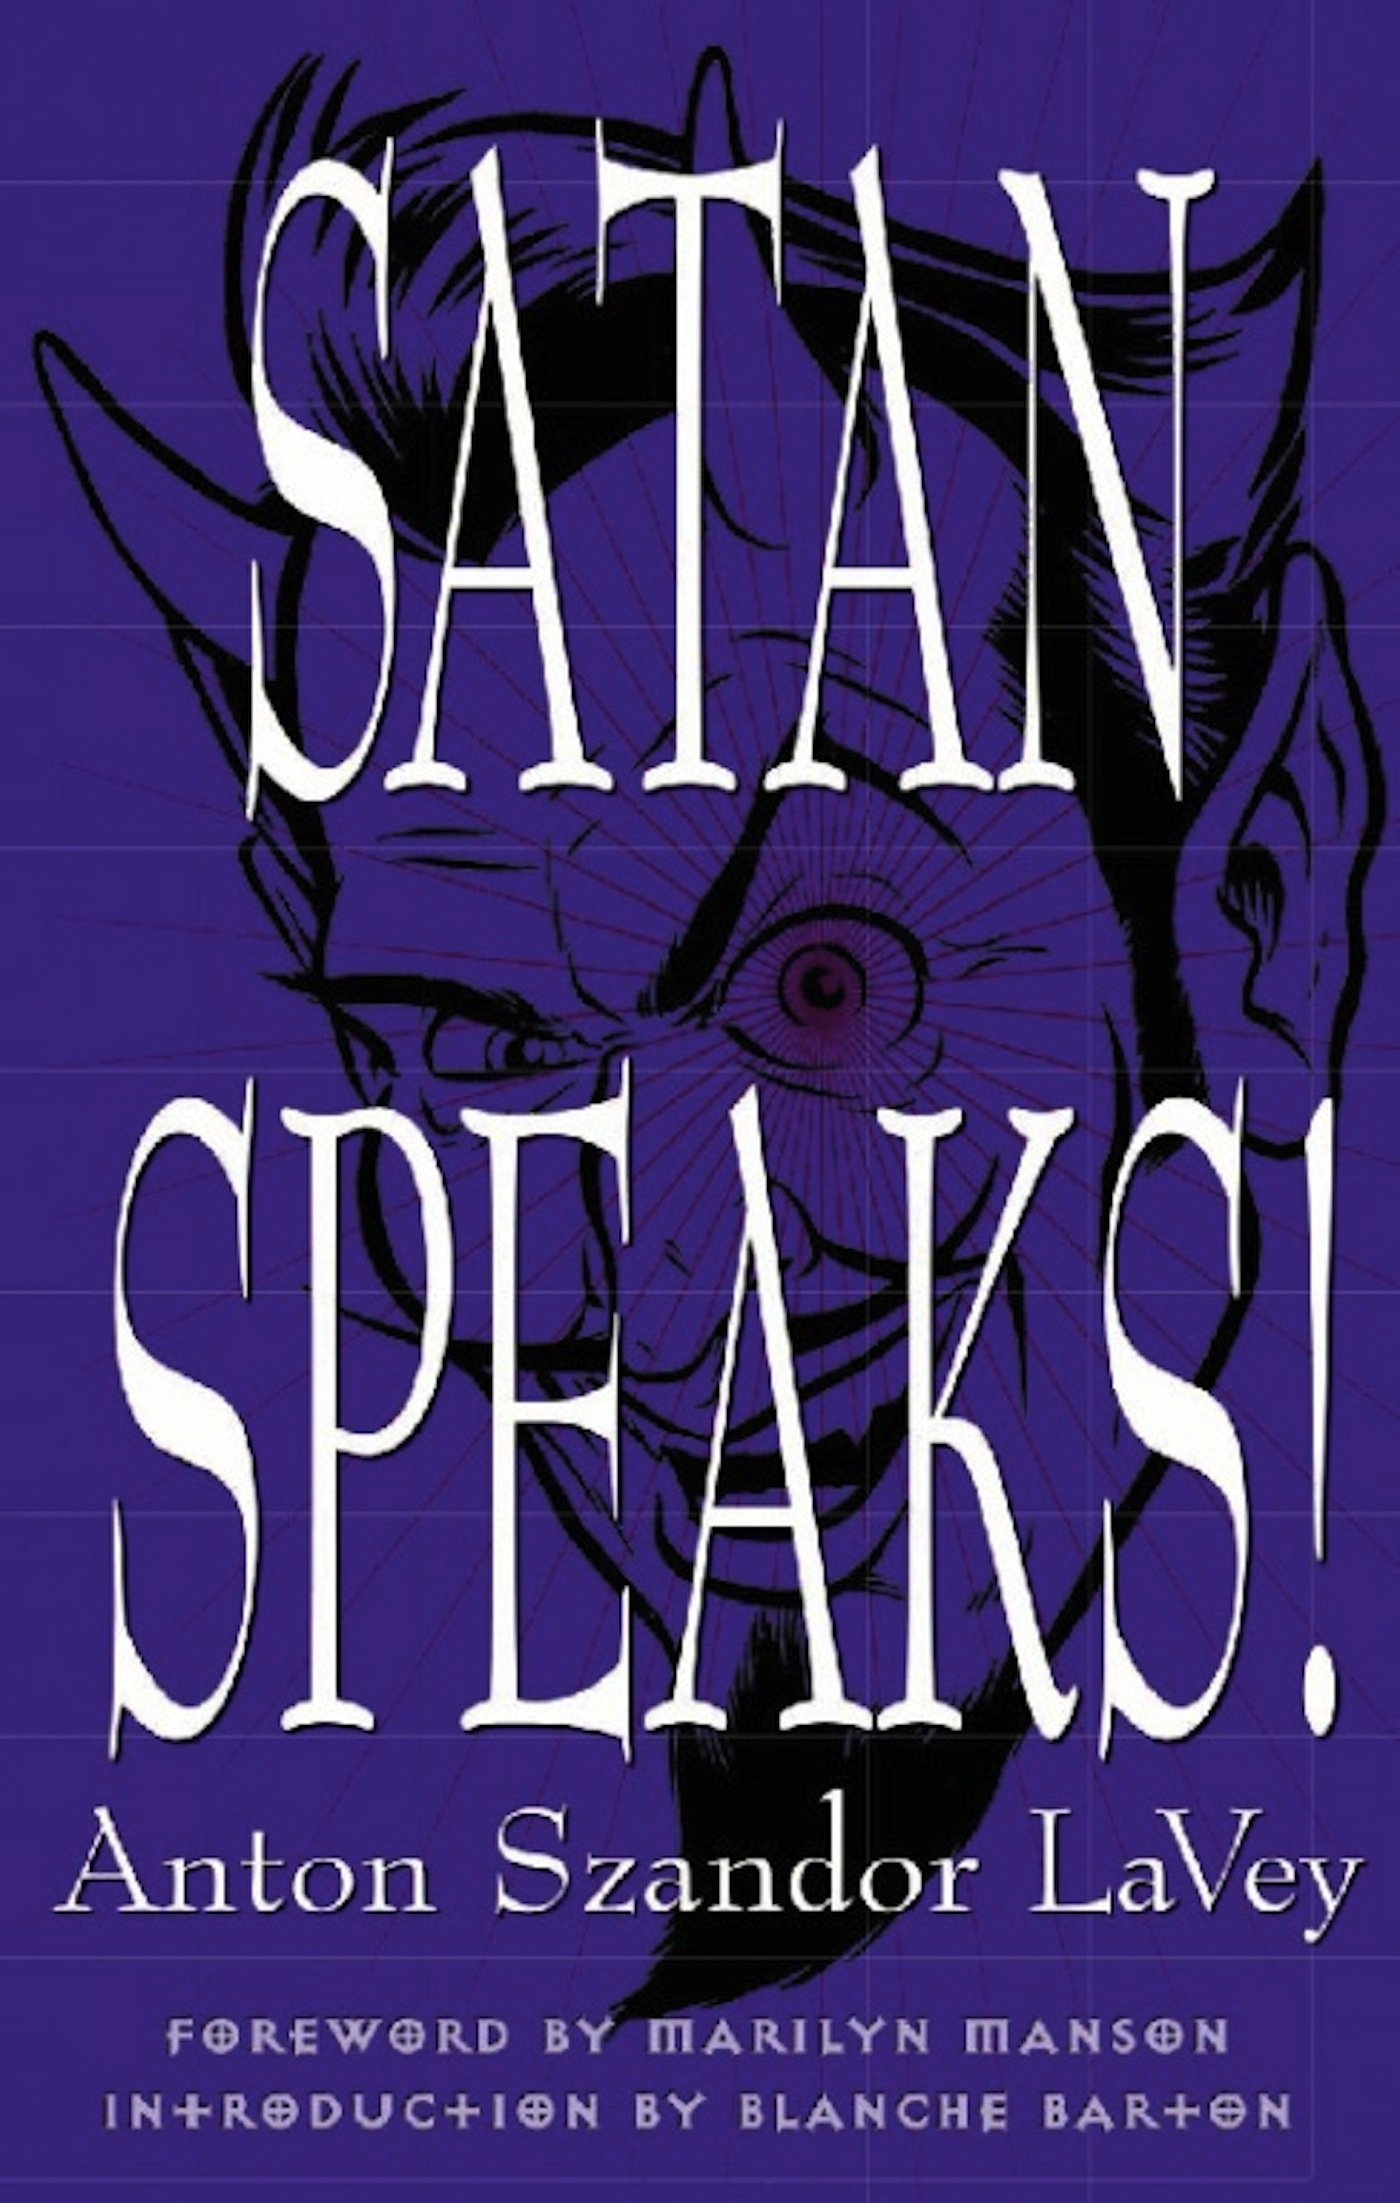 ANTON SZANDOR LAVEY SATAN SPEAKS DOWNLOAD